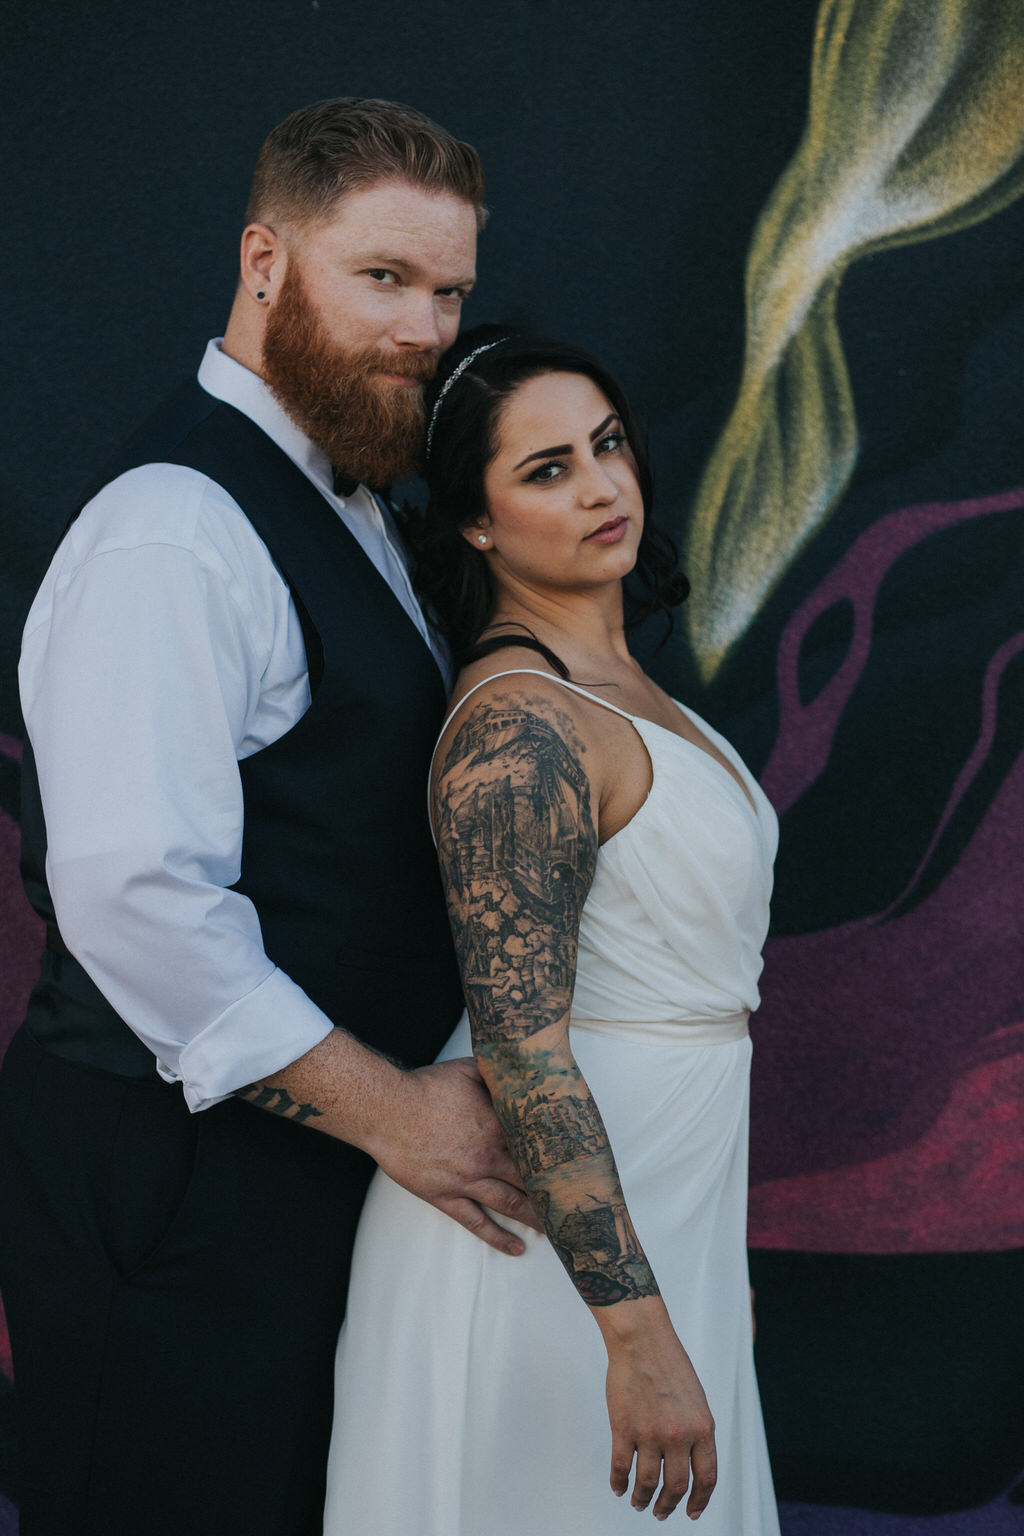 Calgary Wedding Photography Bridal Portraits against graffiti wall in downtown calgary